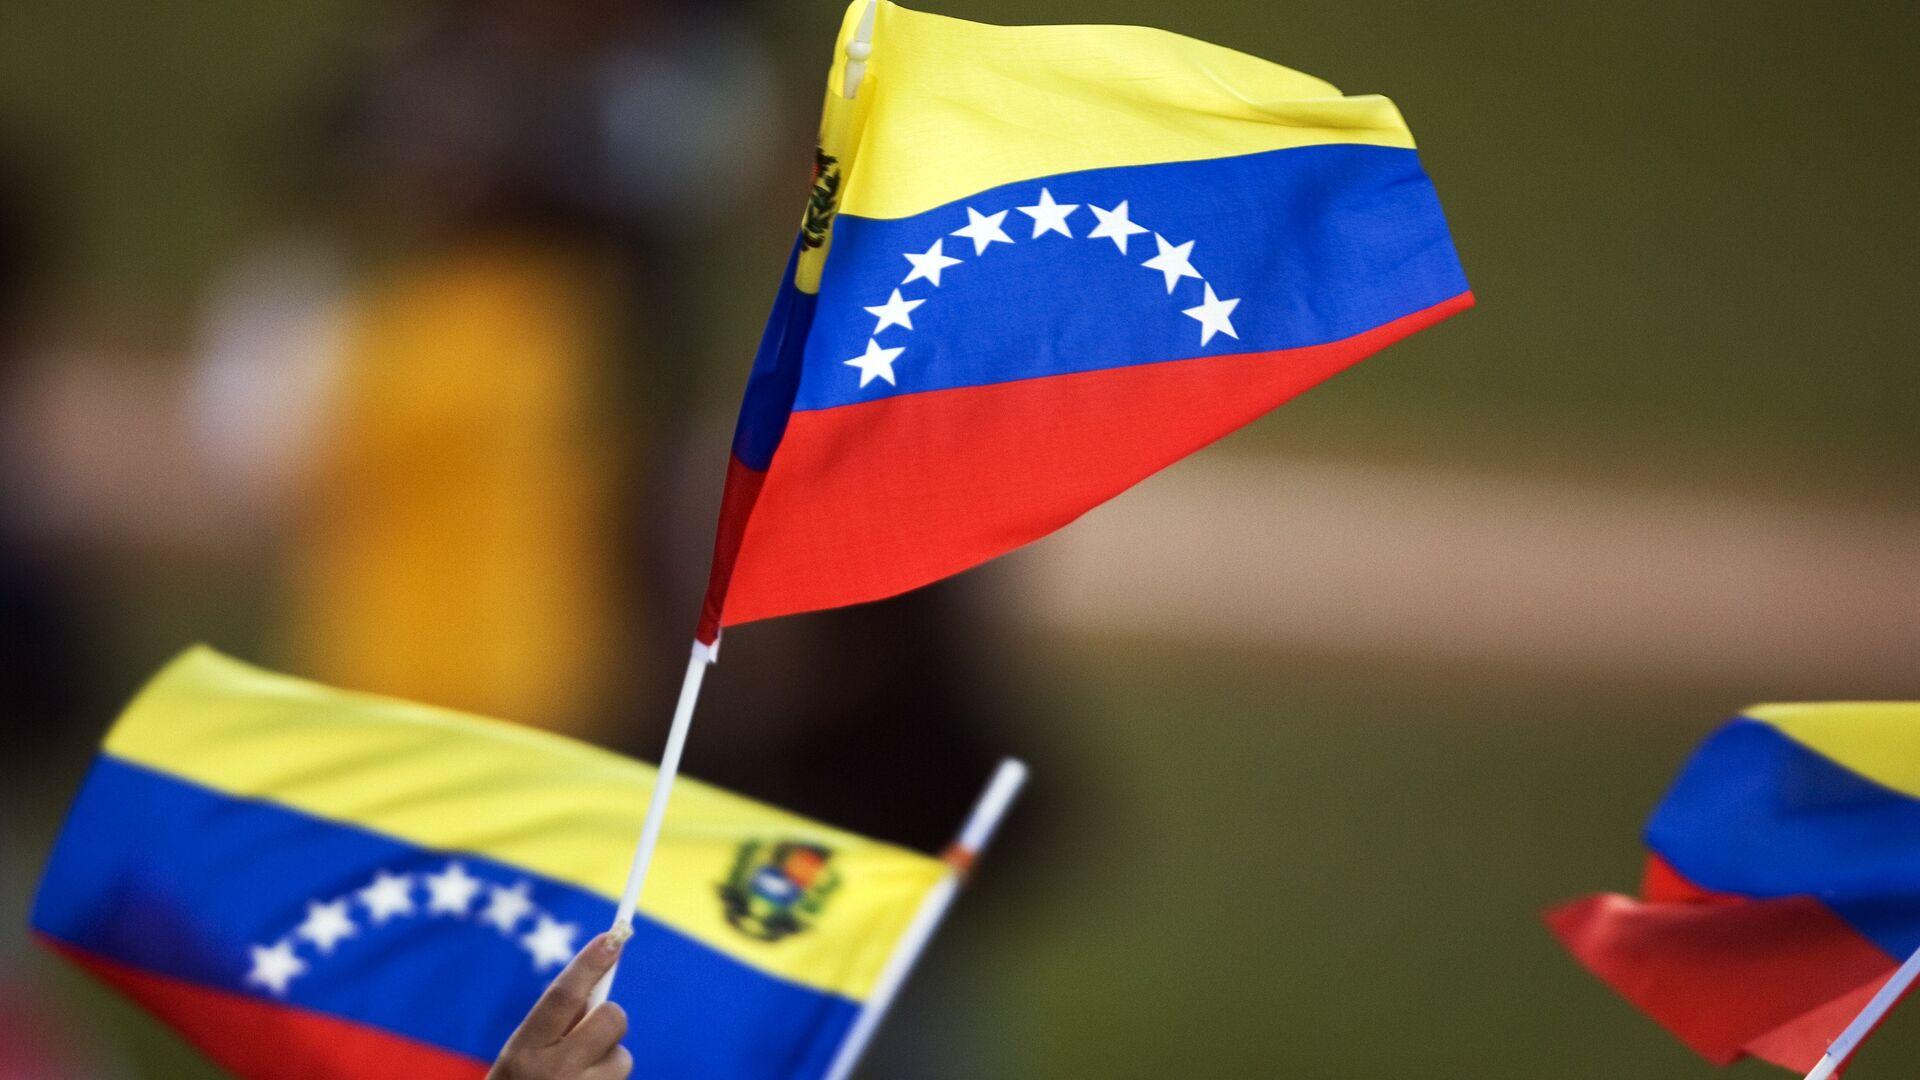 Banderas de Venezuela - Sputnik Mundo, 1920, 24.03.2021